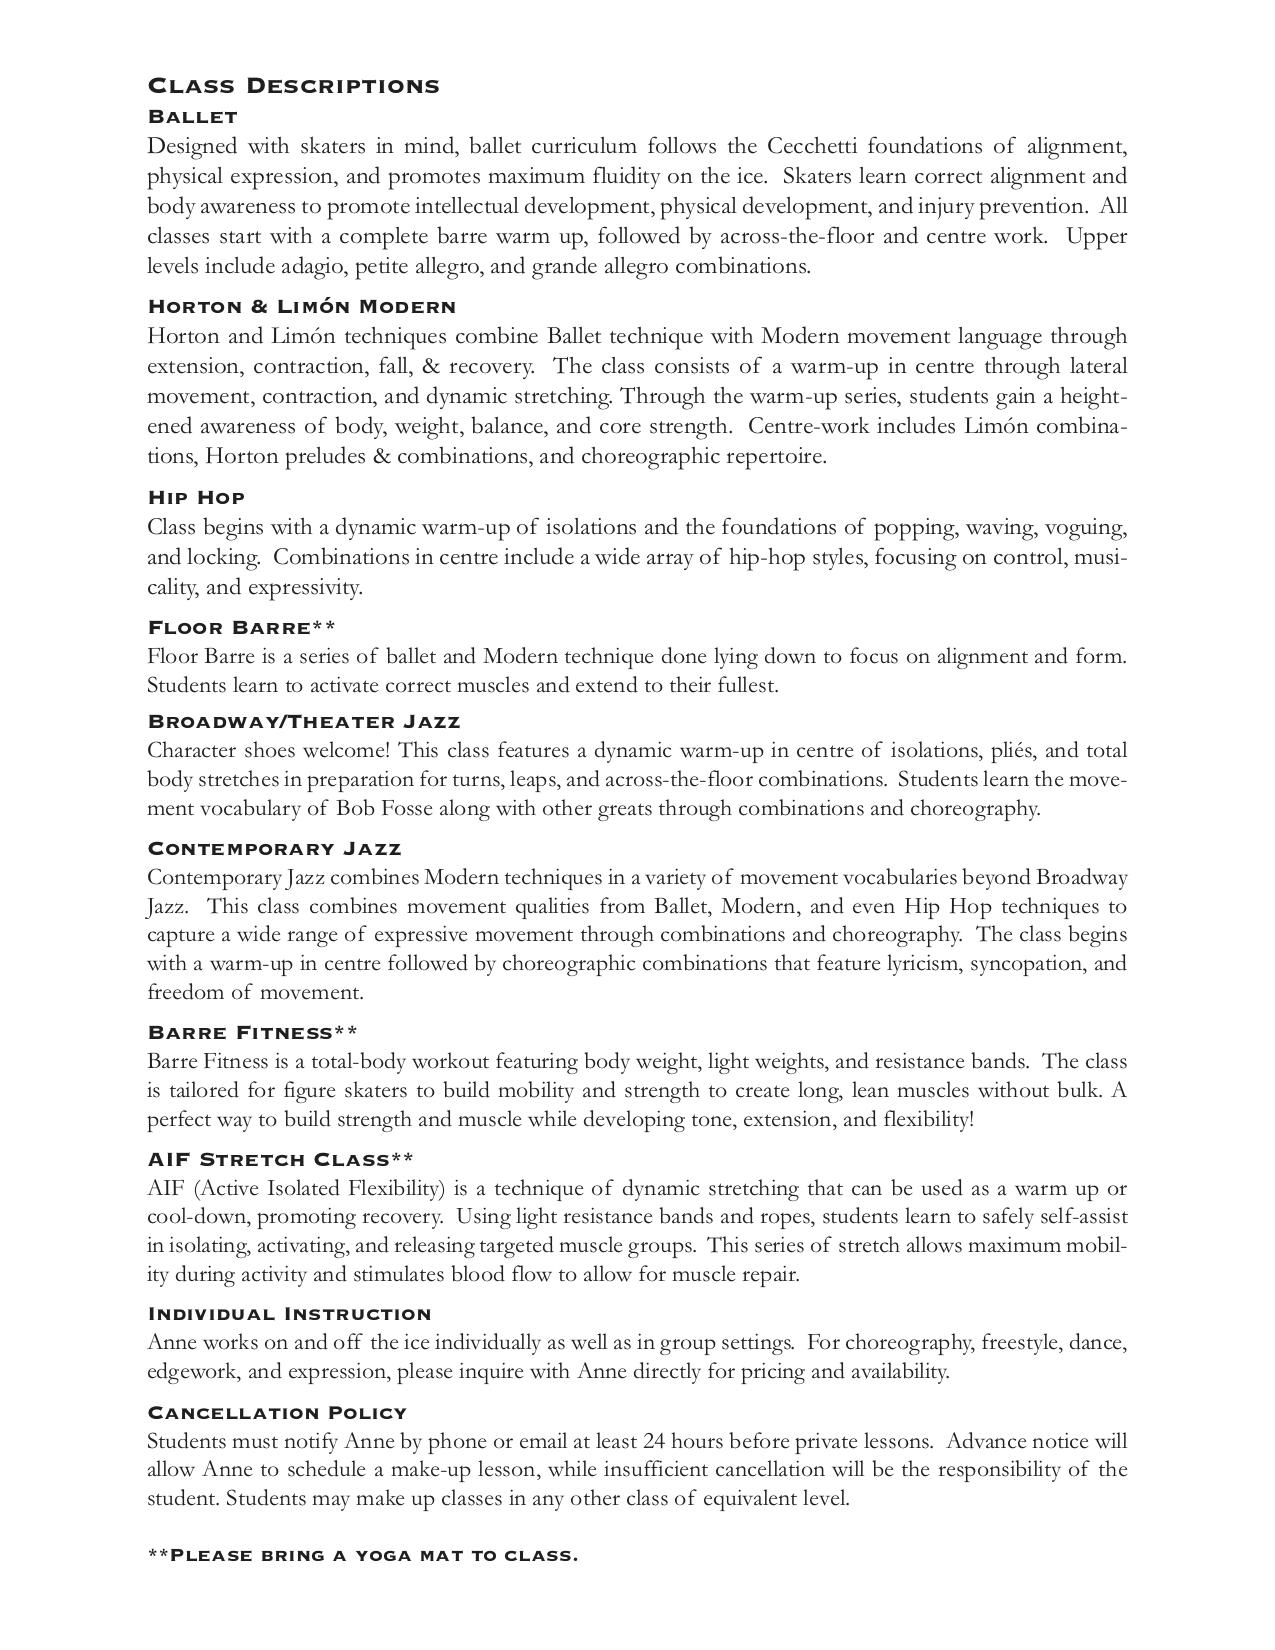 Summer Skate 2018 Web Brochure JPG.jpg